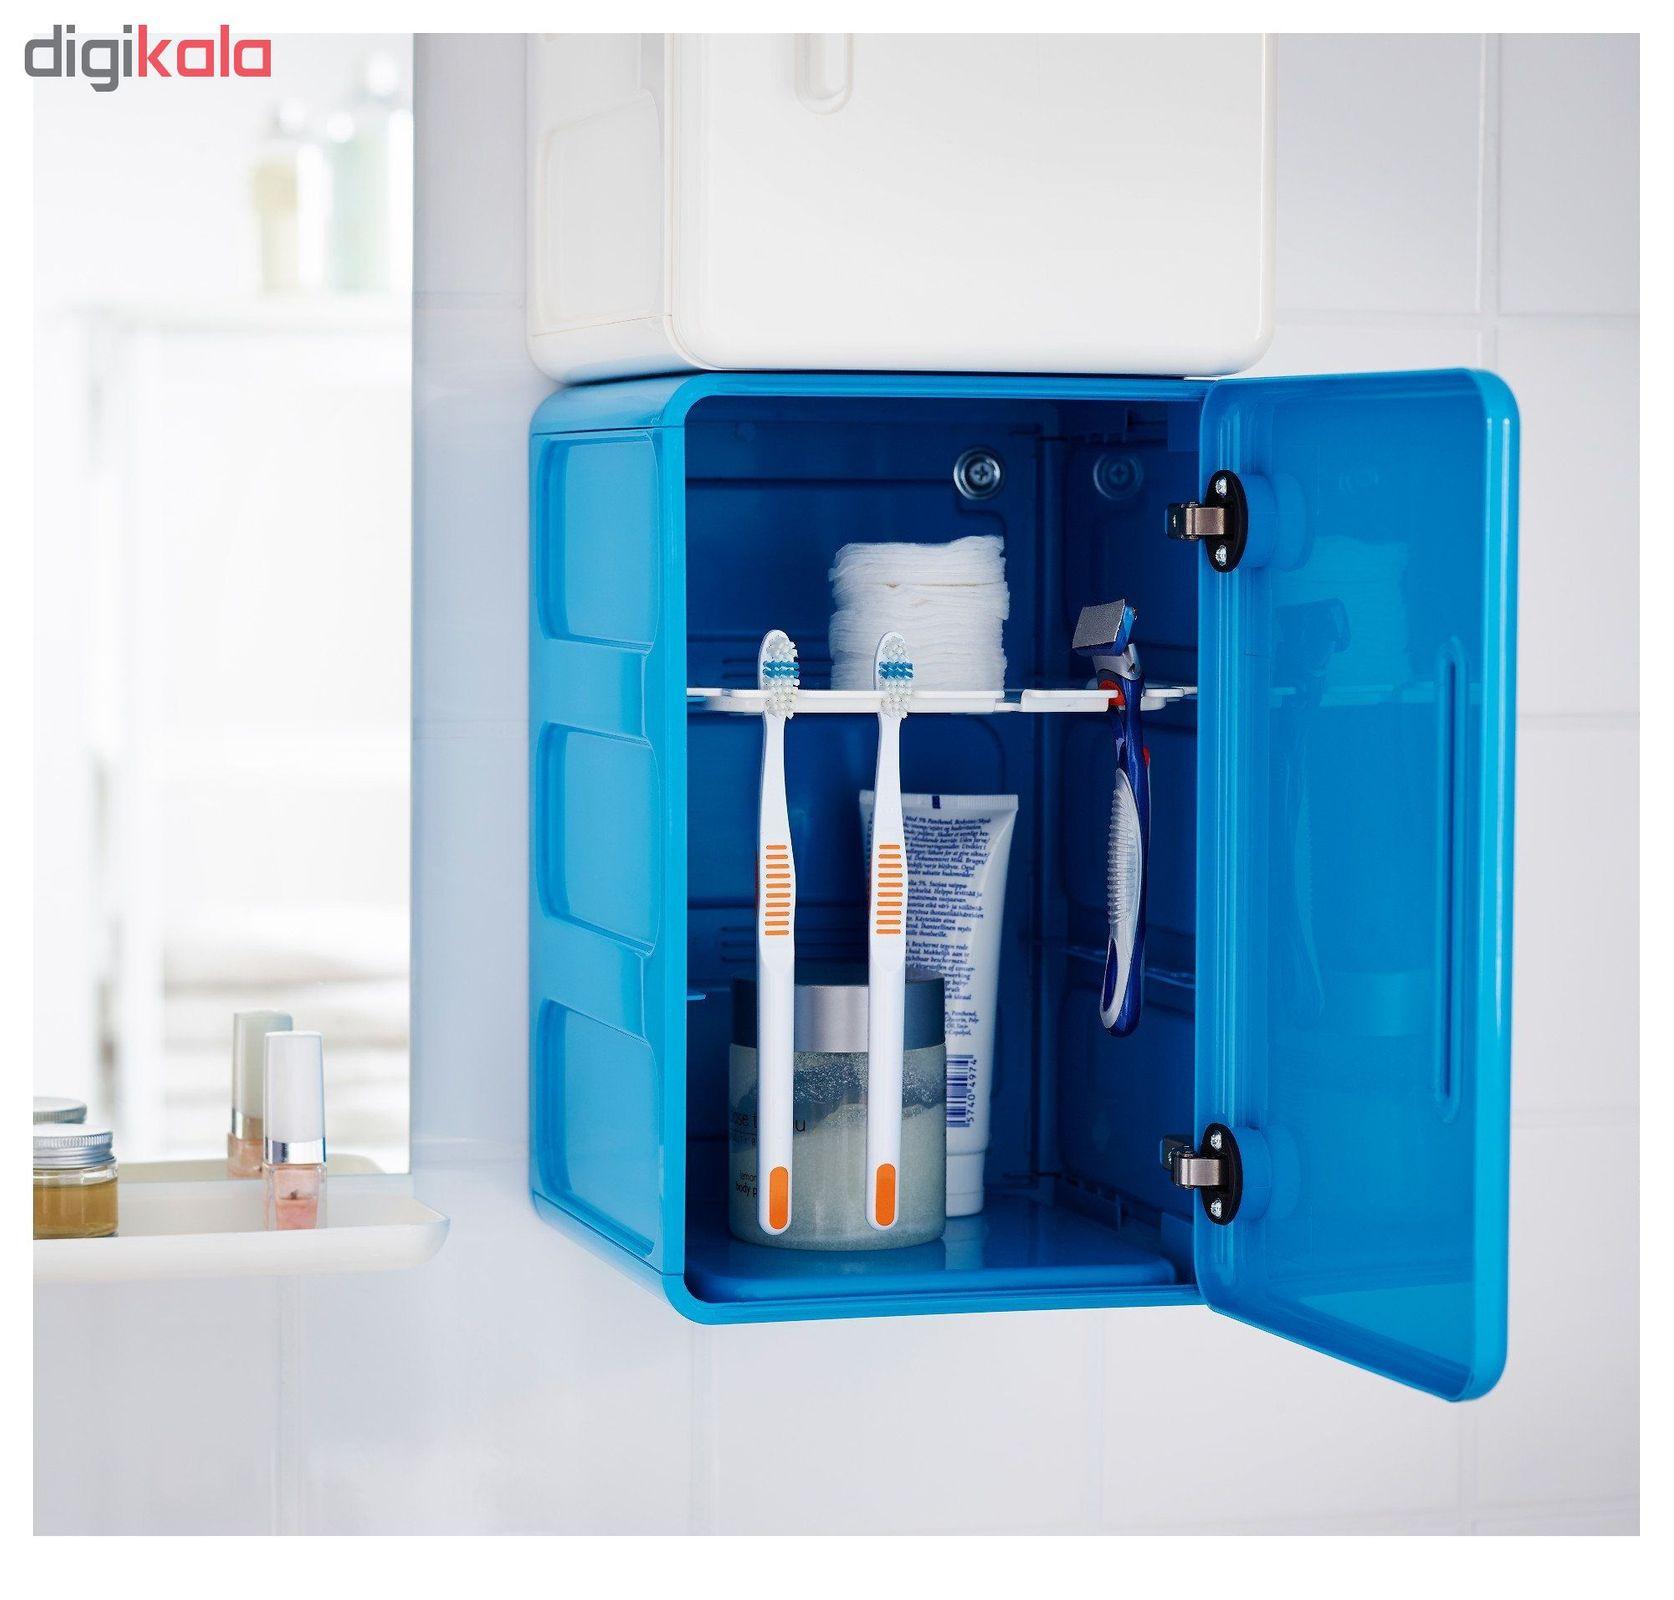 قفسه حمام ایکیا مدل Lejen main 1 3